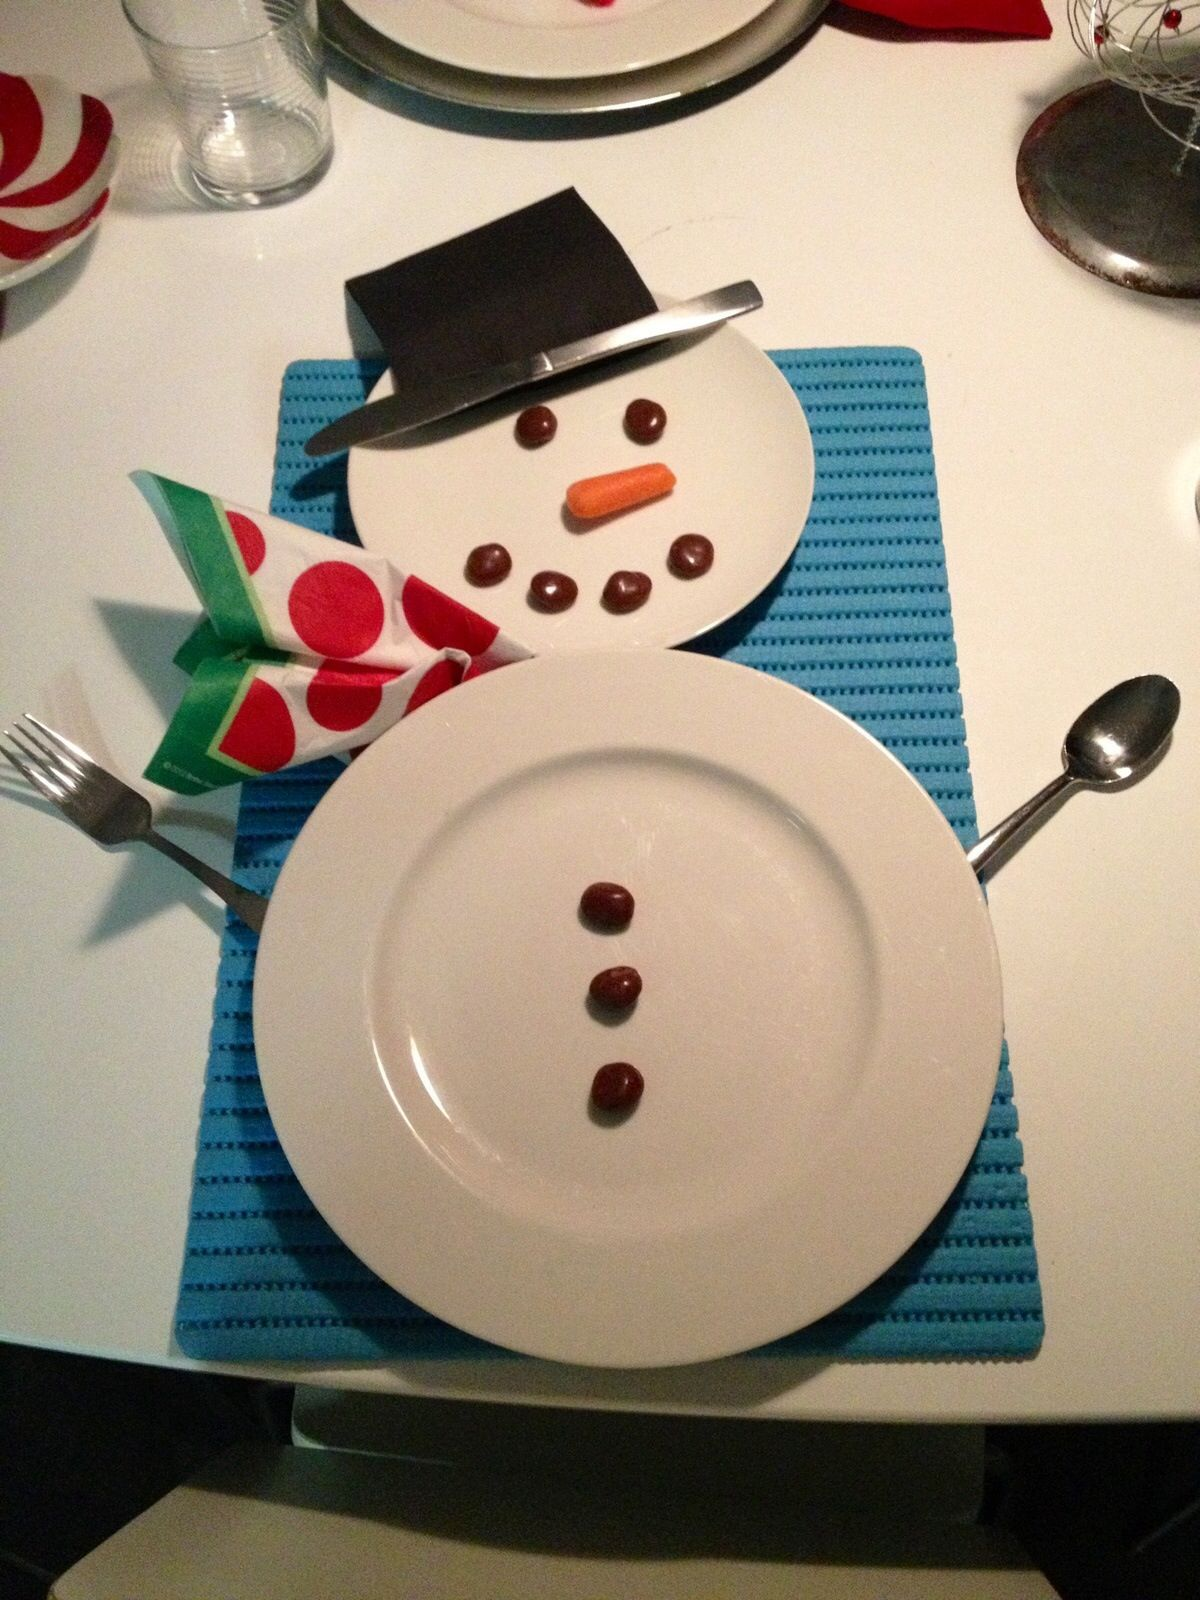 Christmas snowman table decorations